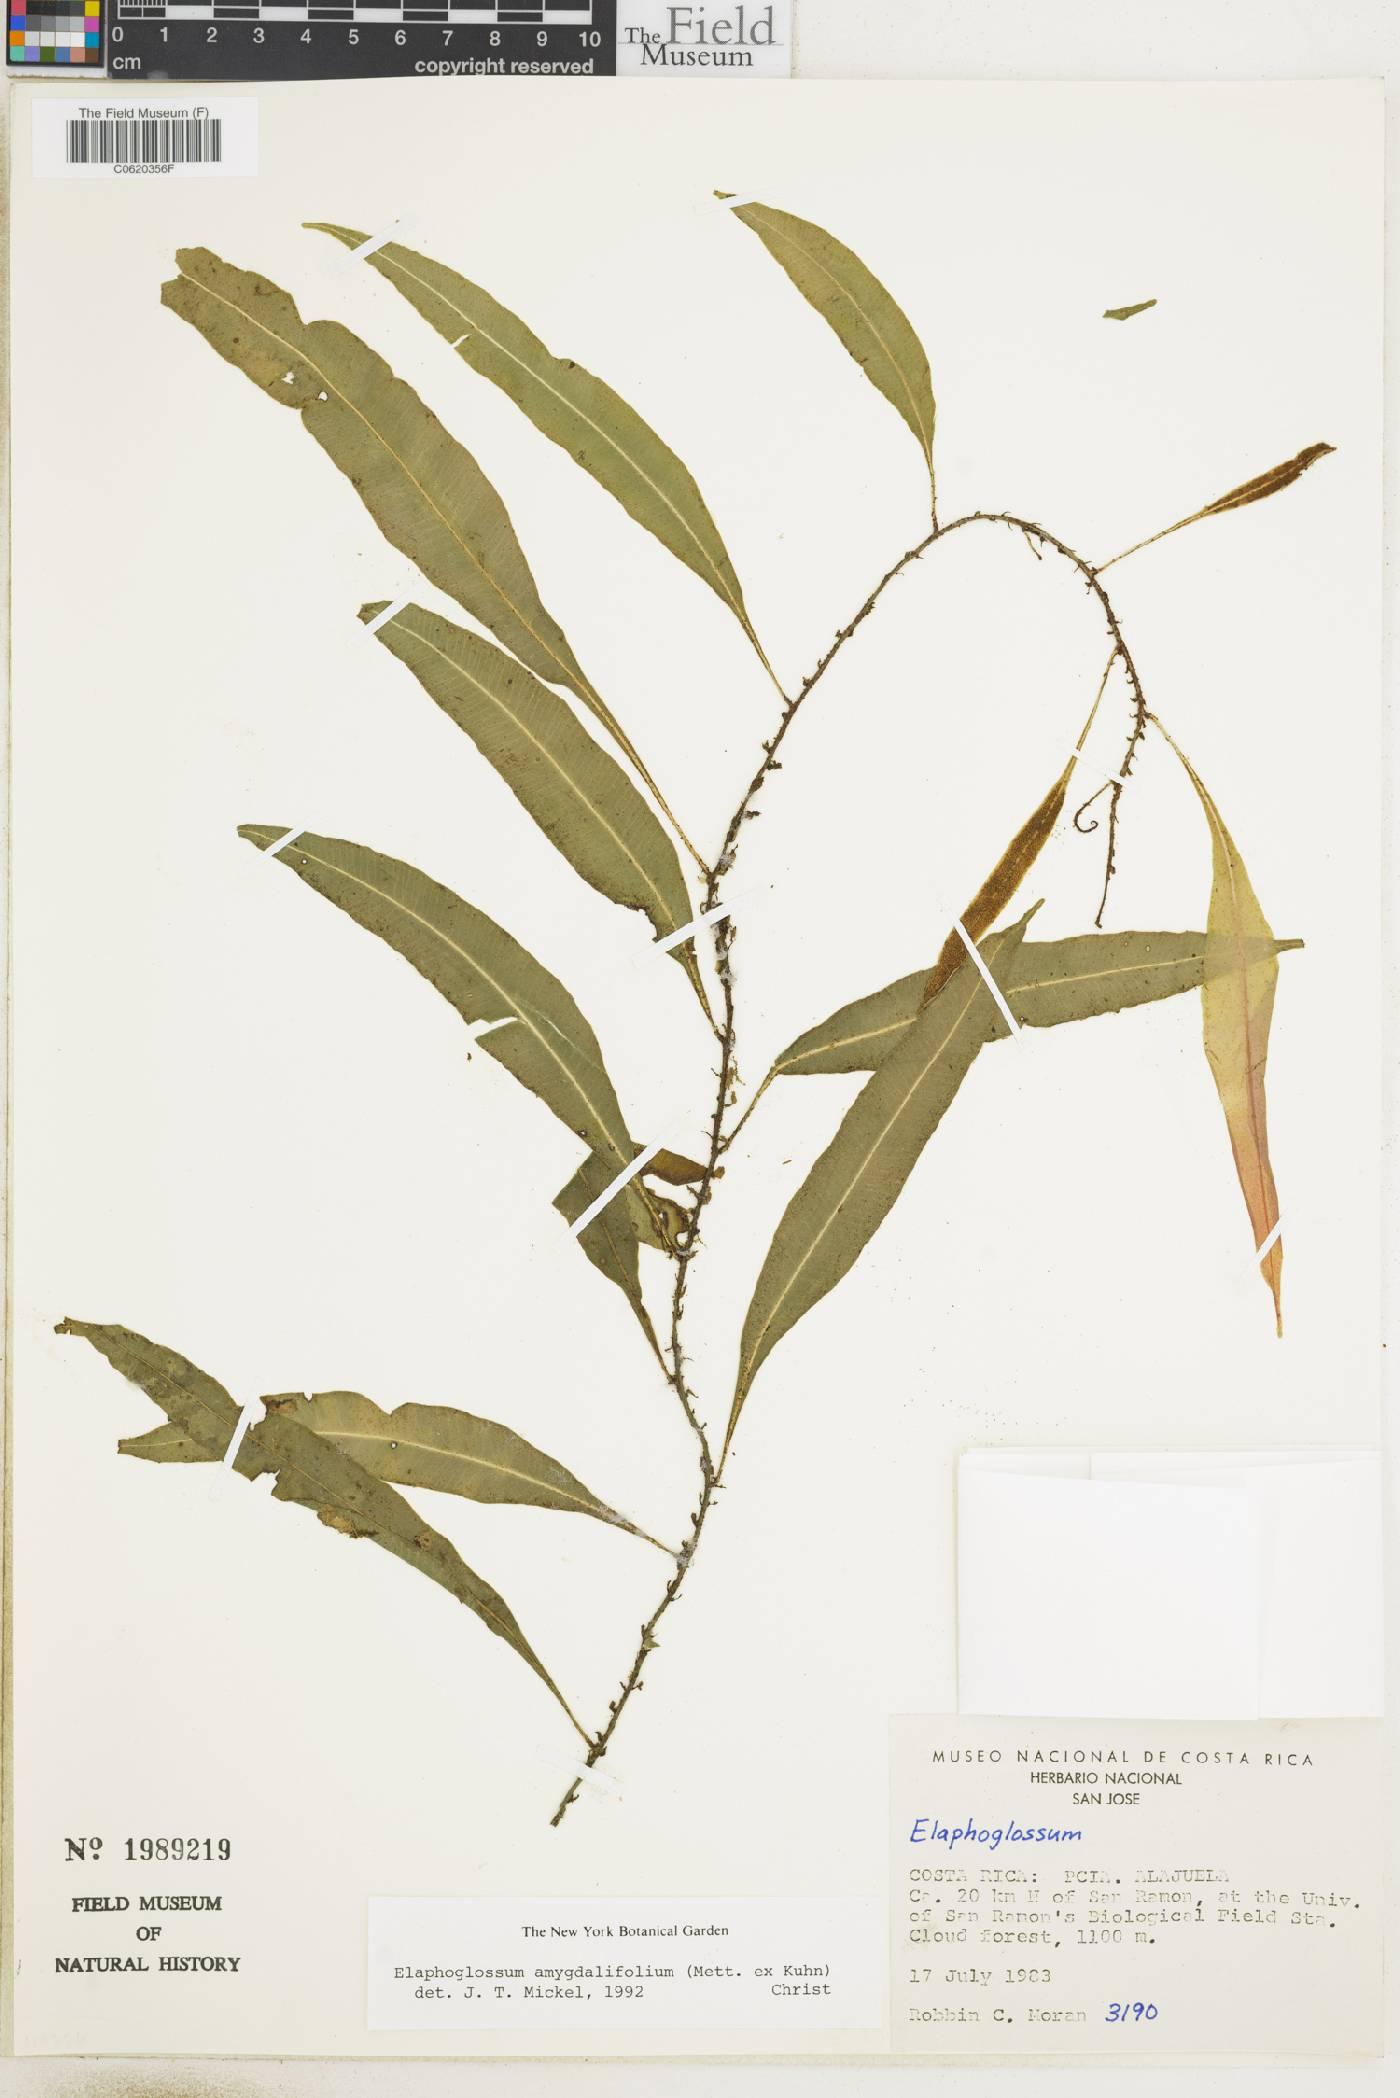 Elaphoglossum amygdalifolium image